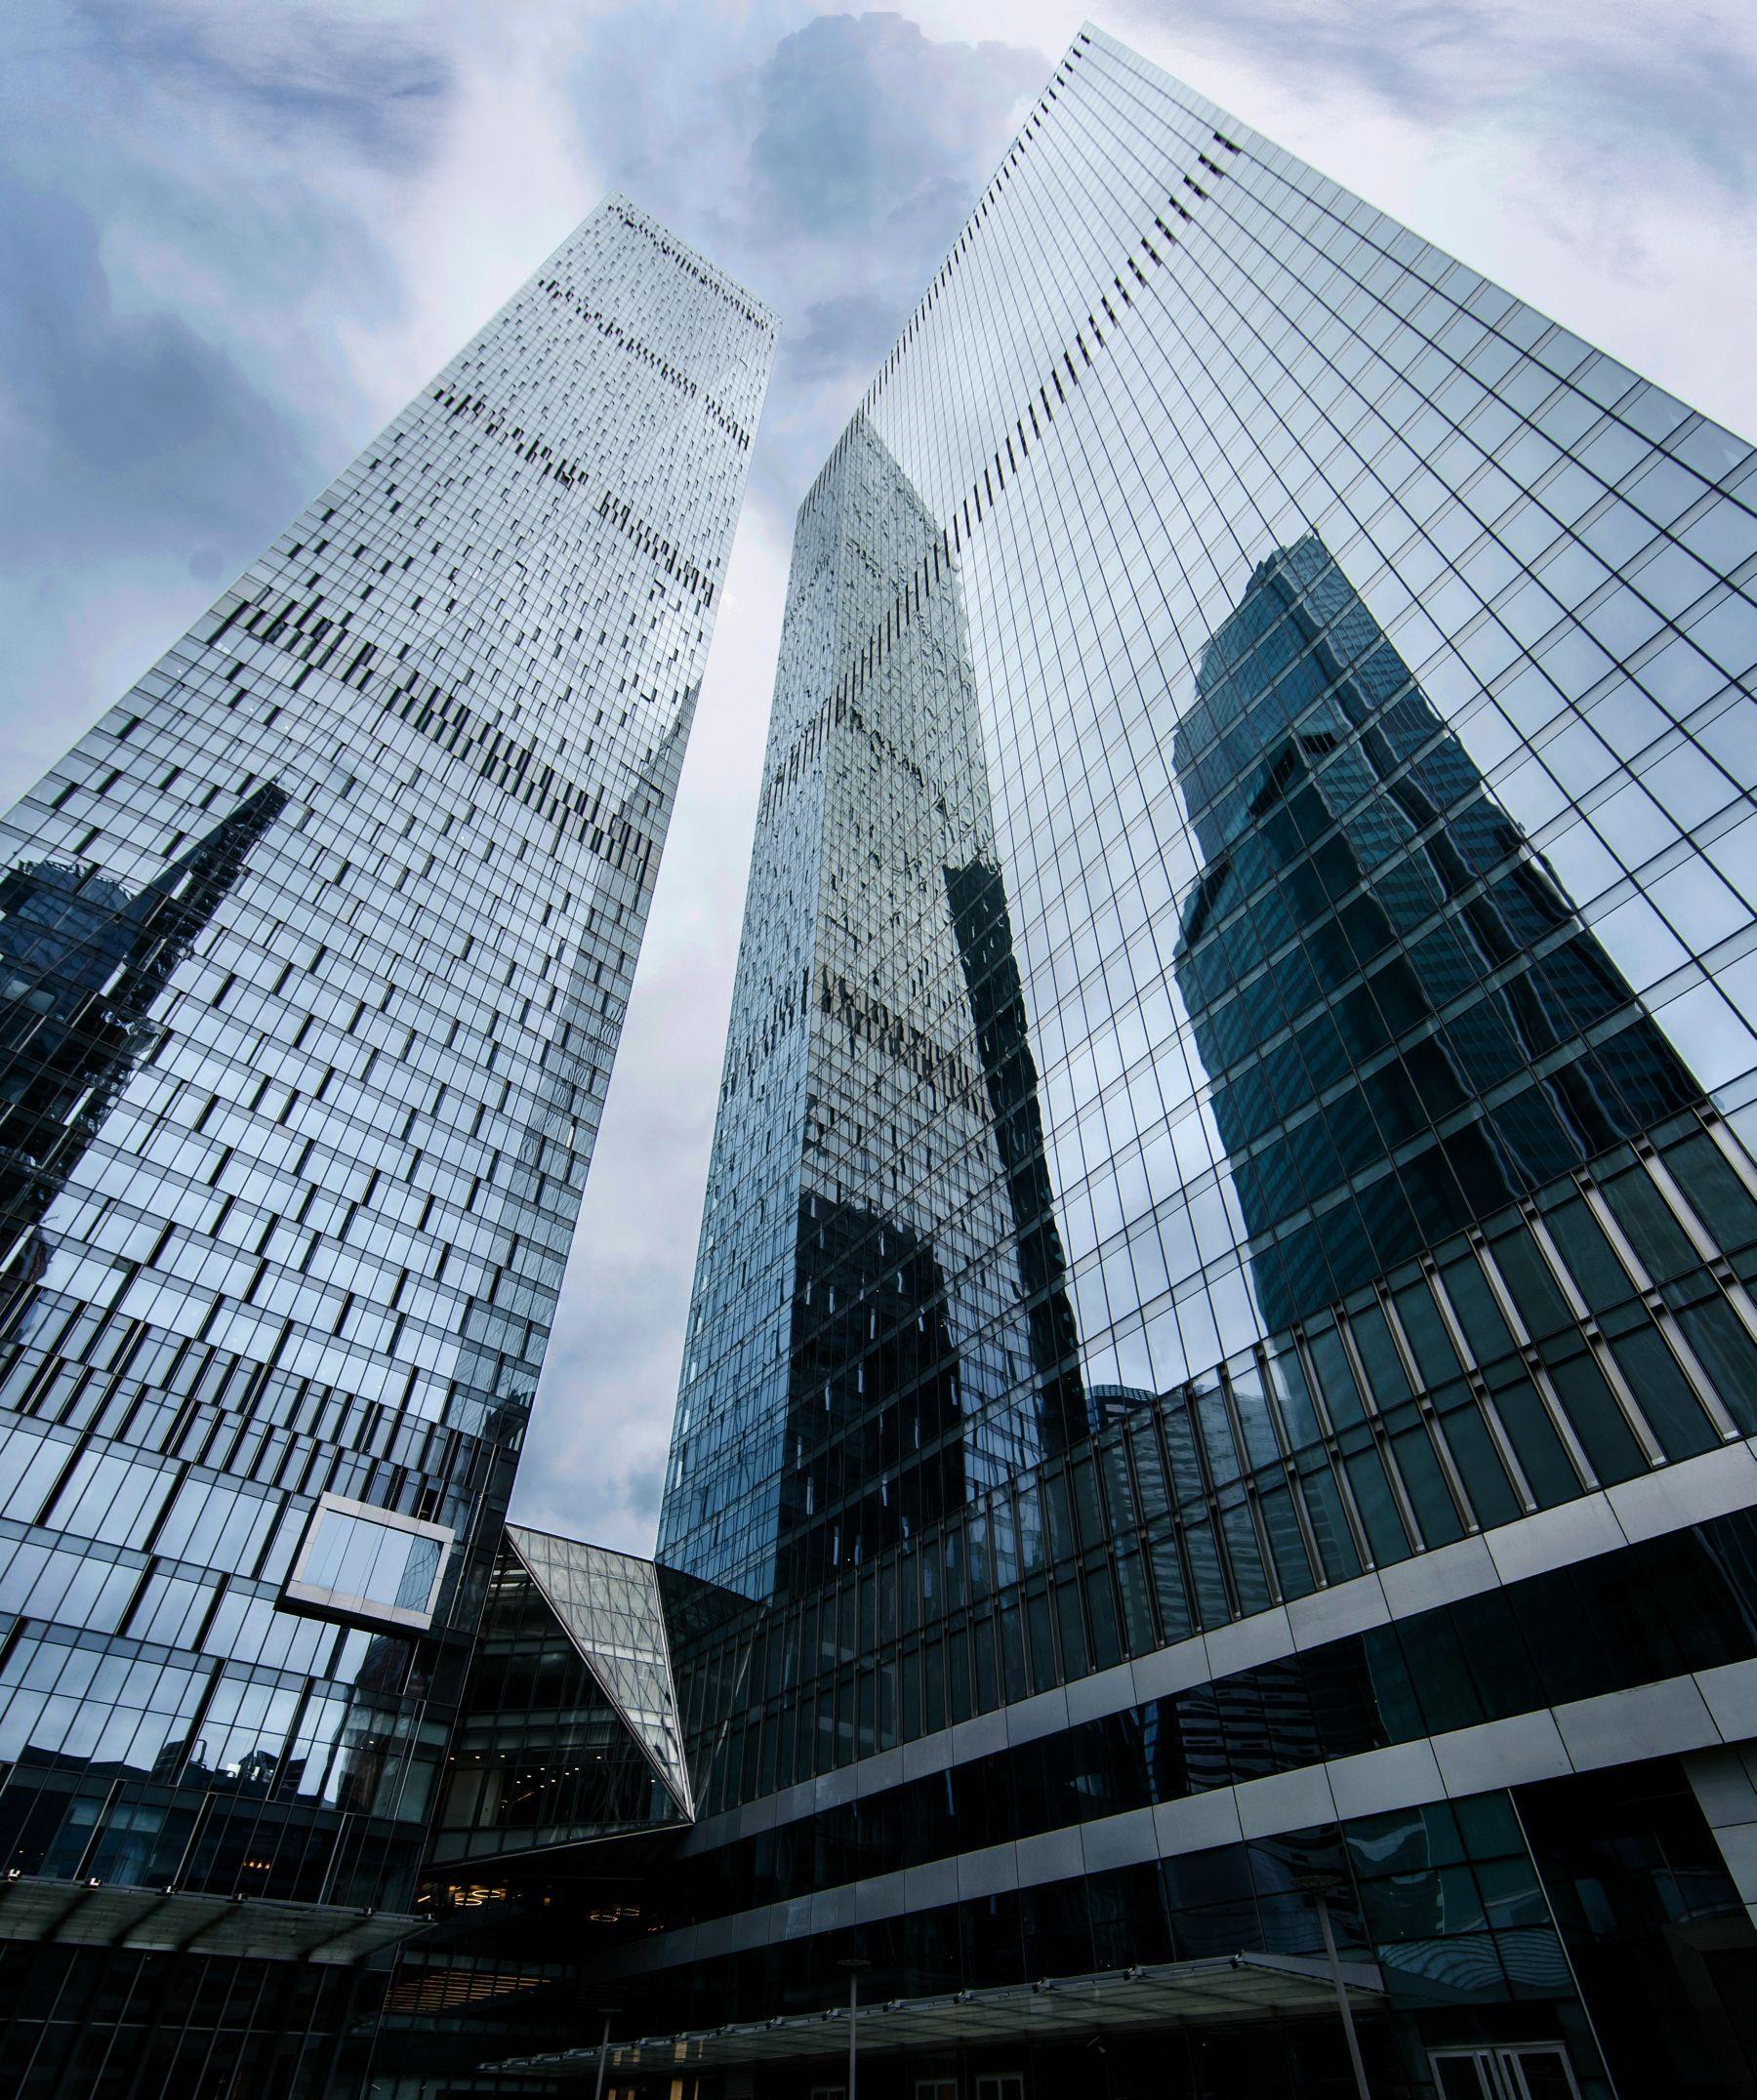 Фото ЖК ОКО от Capital Group. Жилой комплекс OKO